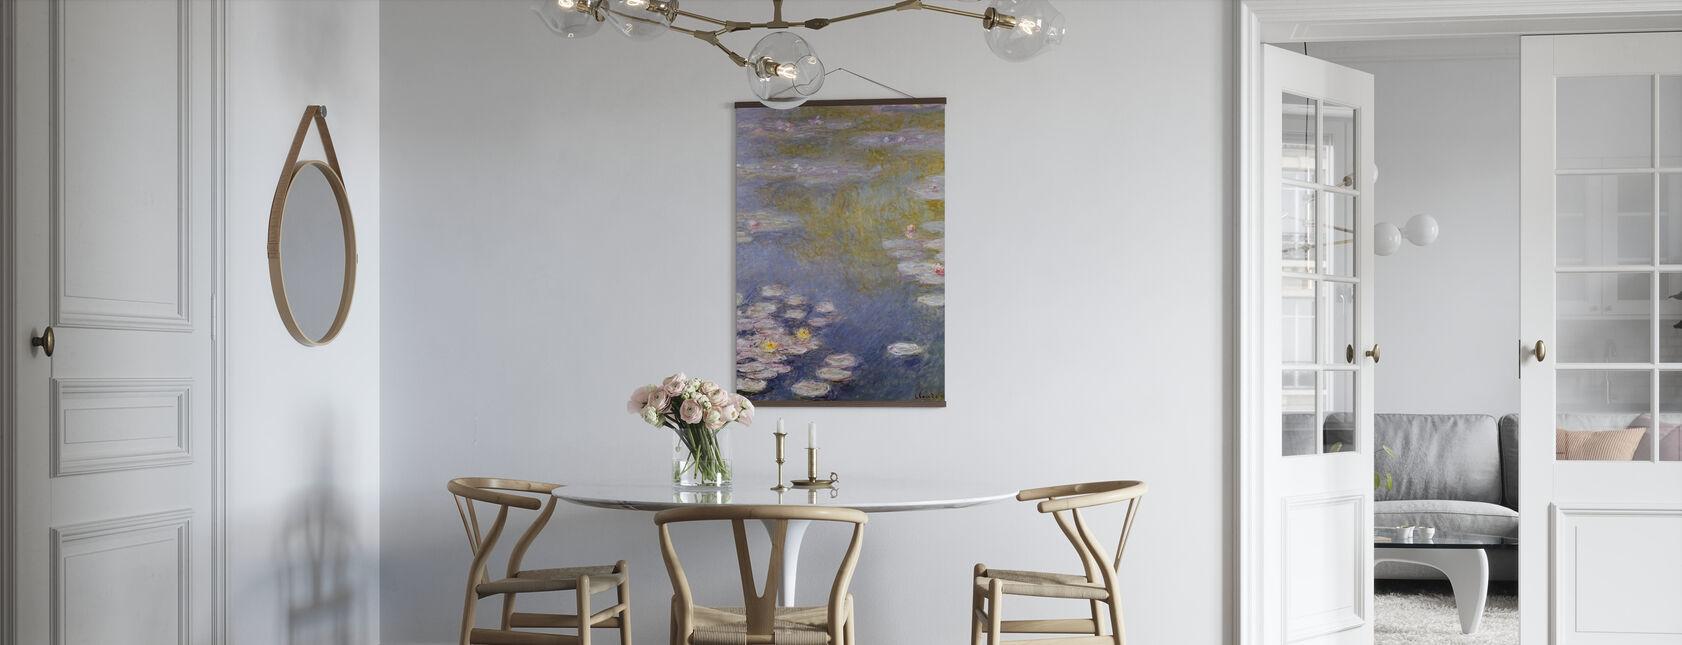 Monet, Claude - Nympheas bij Giverny - Poster - Keuken